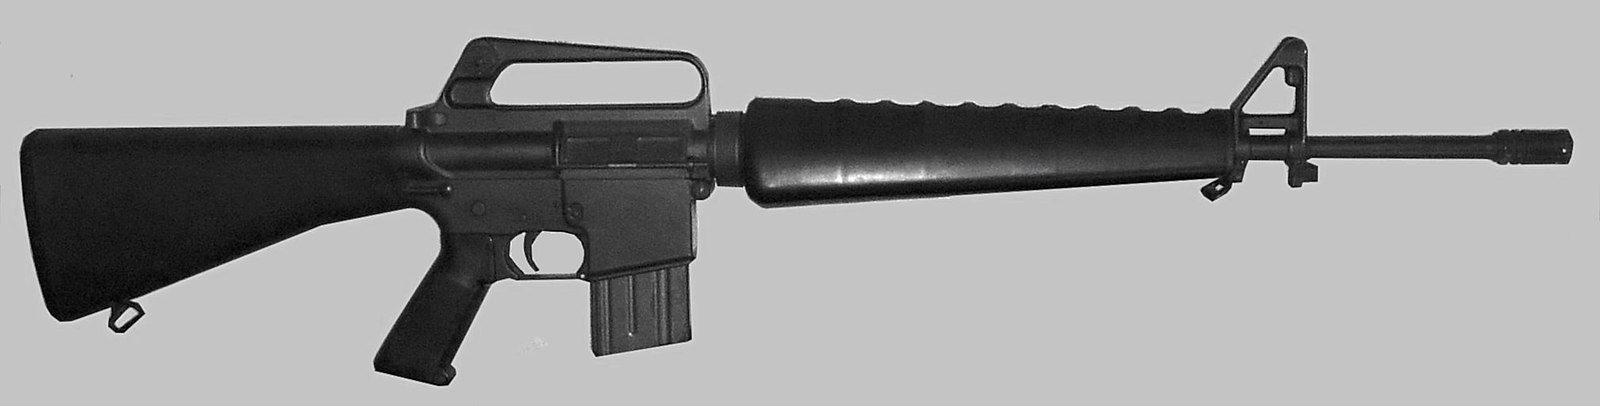 Colt A1 Sporter. John Paul talks to ARBuildJunkies about the best AR-15 Upgrades